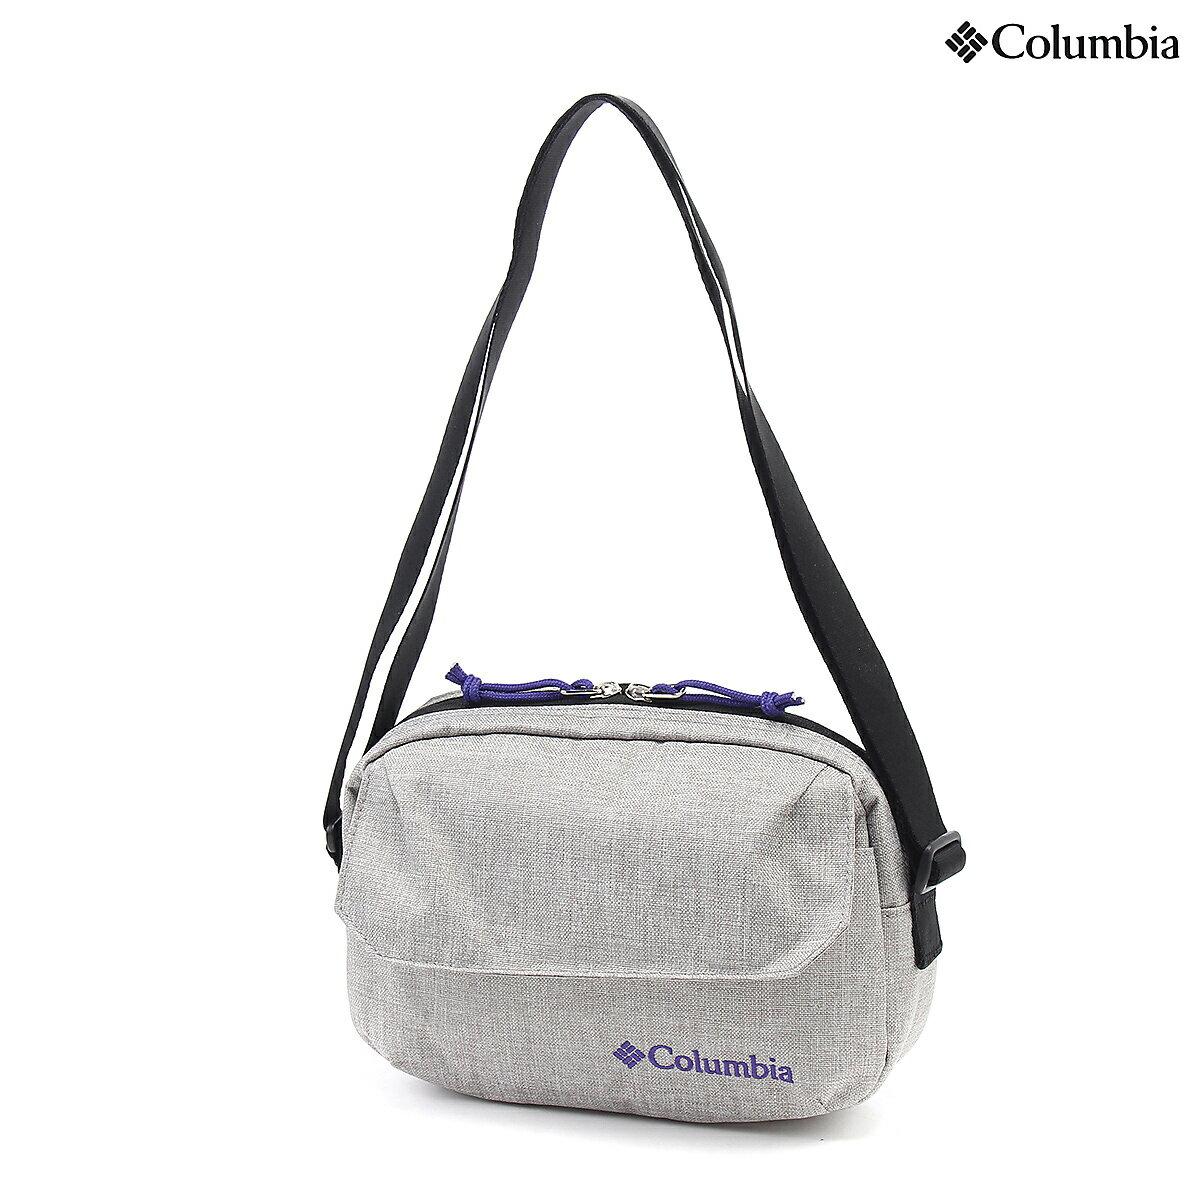 Columbia (コロンビア) トレッキング アウトドア ショルダーバック ヤムヒルフォークショルダー O/S COLUMBIA GREY PU8157-039